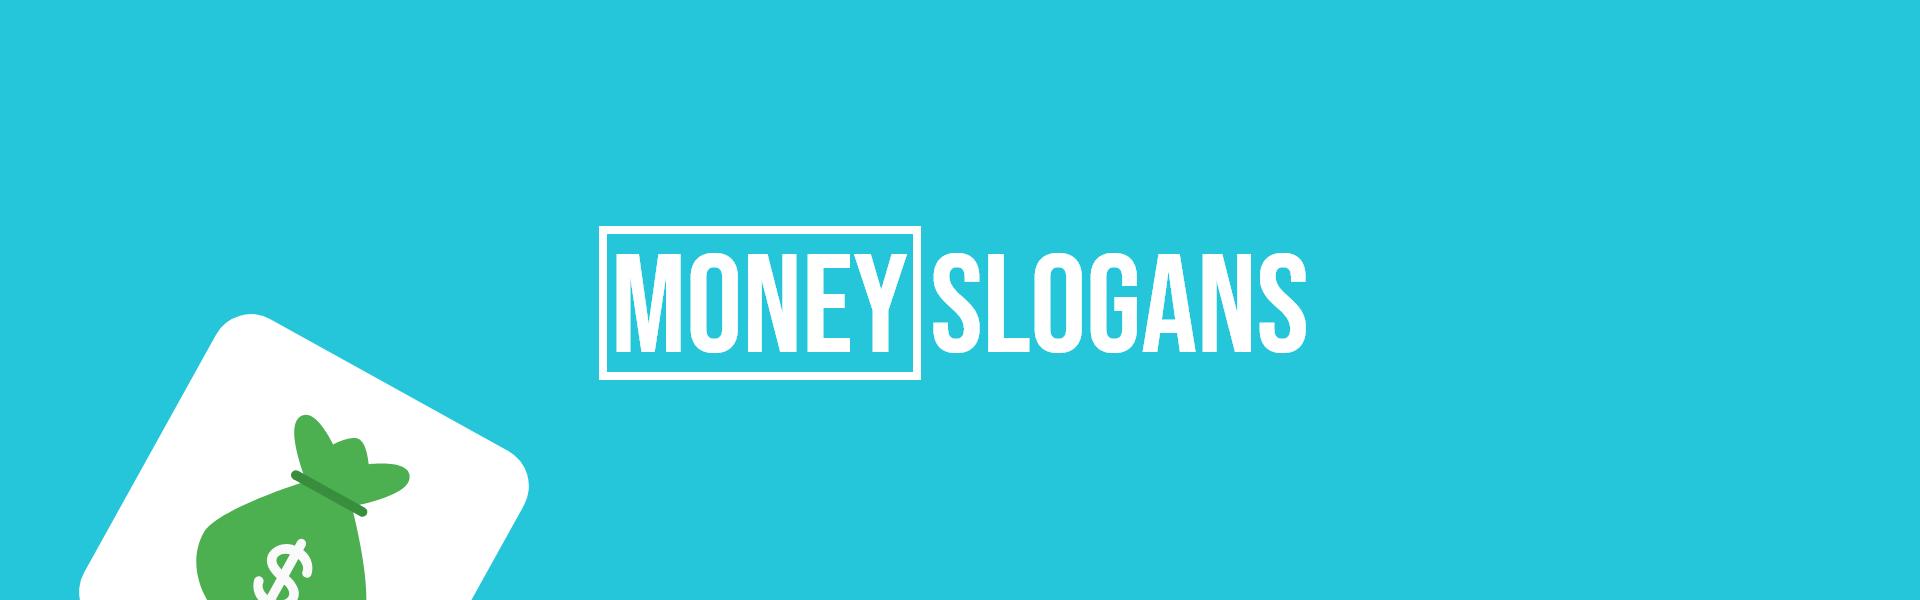 money slogans taglines